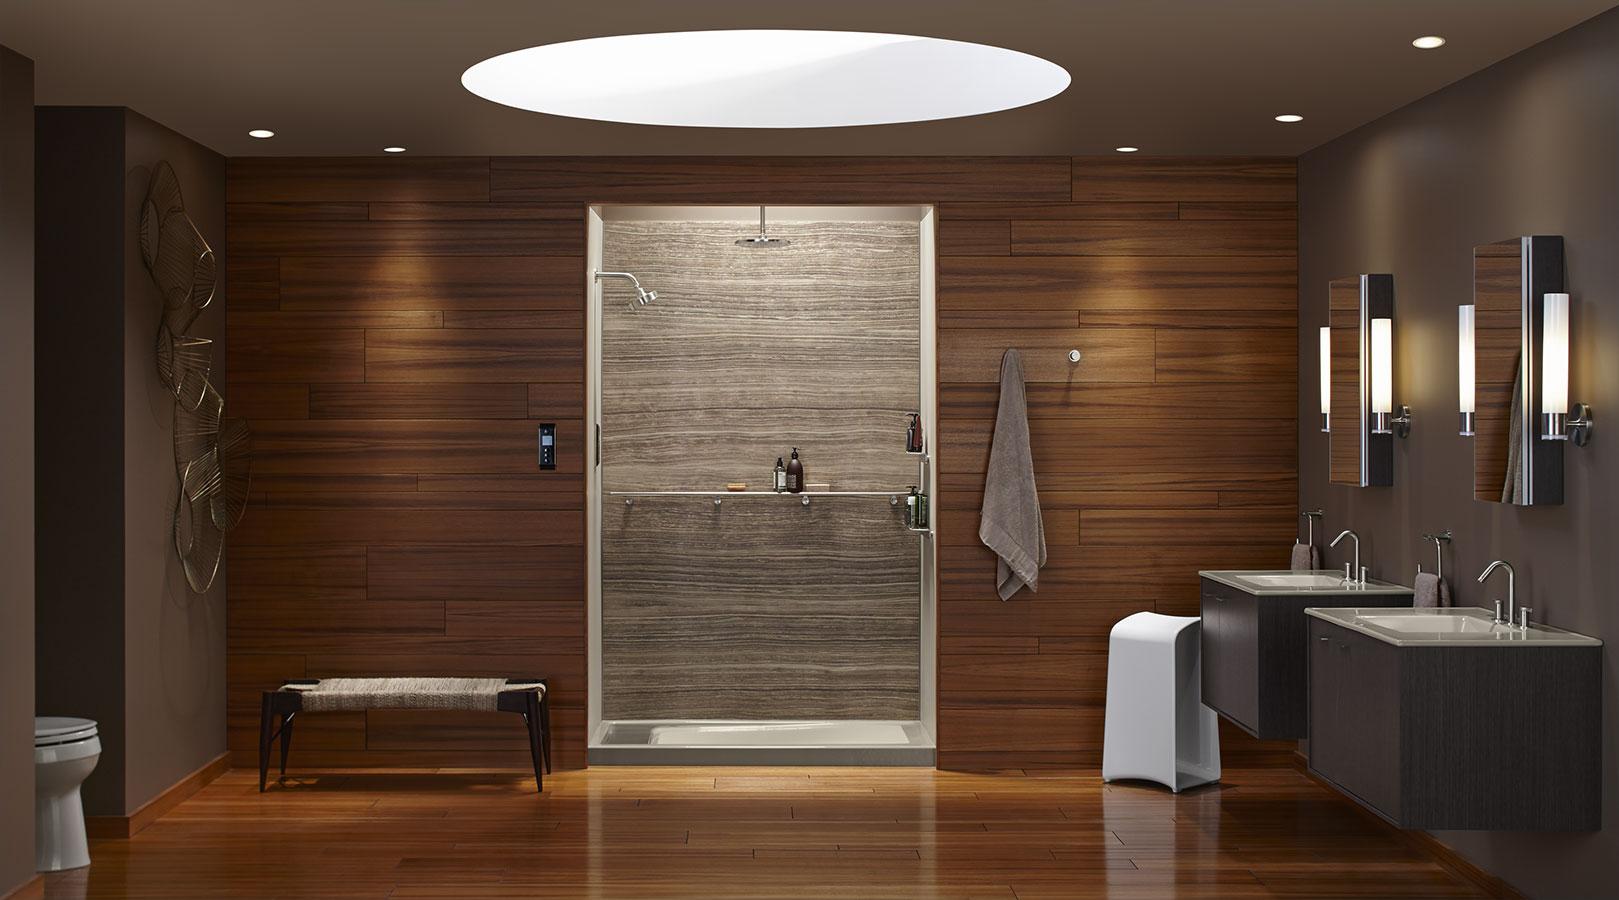 Kohler Featured Gallery Kitchen Bath Showroom Accessories Dartmouth Ma Middletown Ri